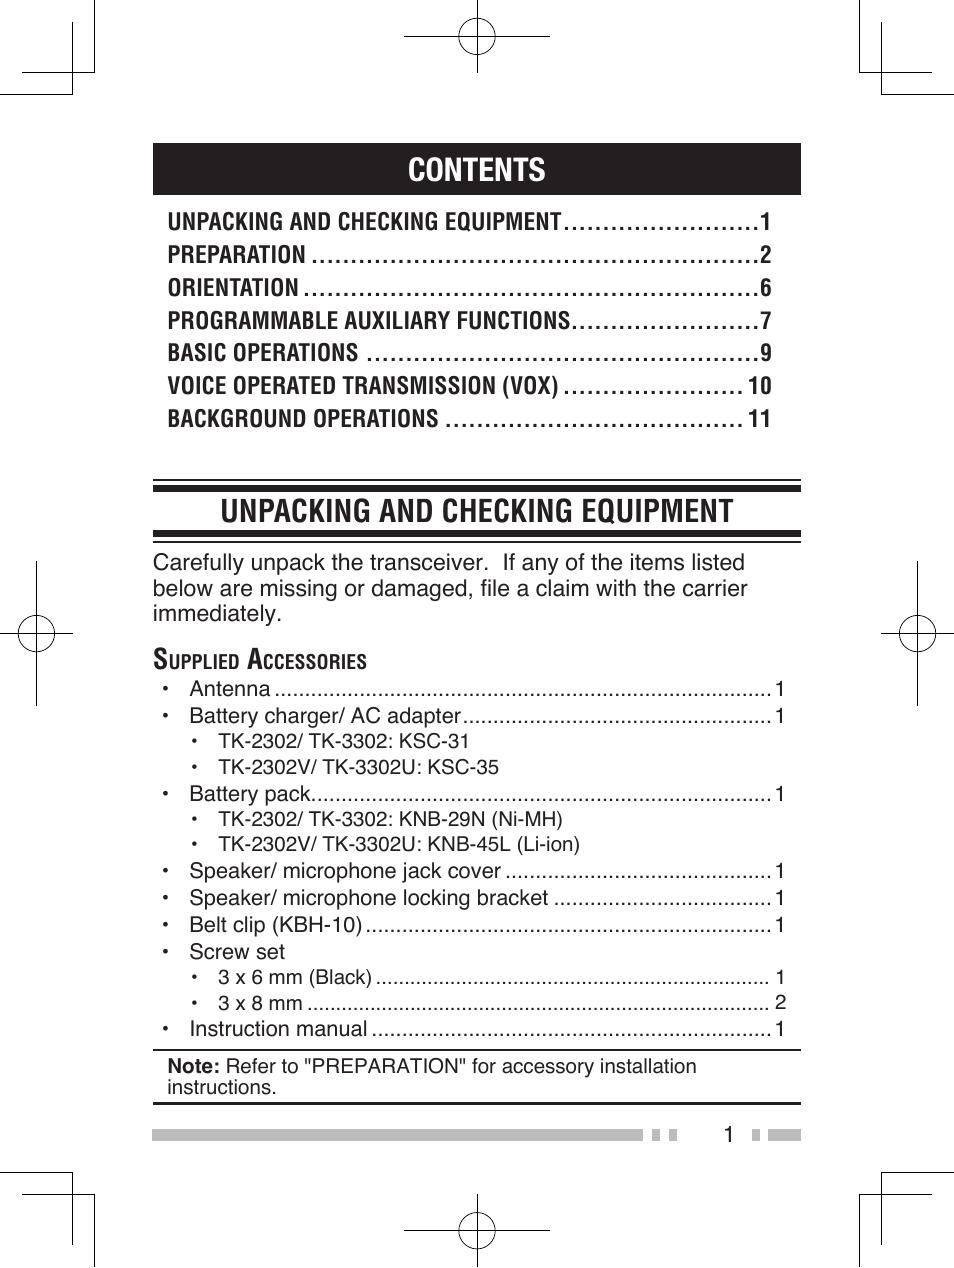 kenwood tk 3302 user manual page 10 21 also for tk 2302v tk 2302 tk 3302u tk 2306 tk 2302e tk 3302e3 tk 3302e